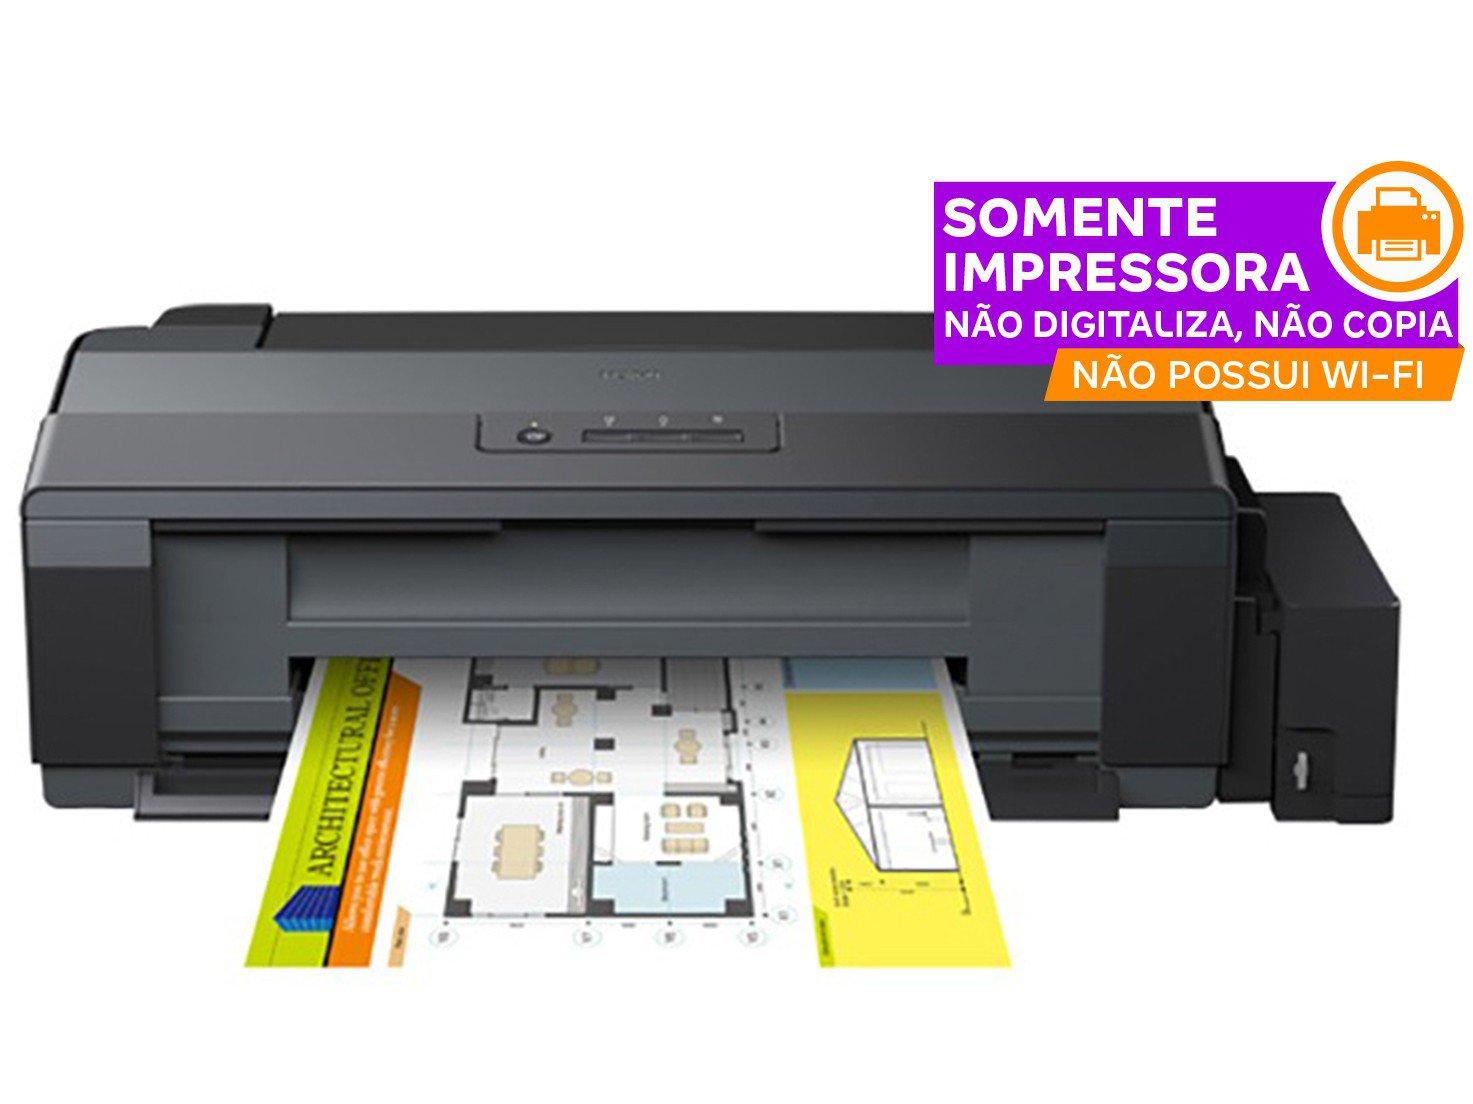 Foto 2 - Impressora Epson EcoTank L1300 Colorida - USB